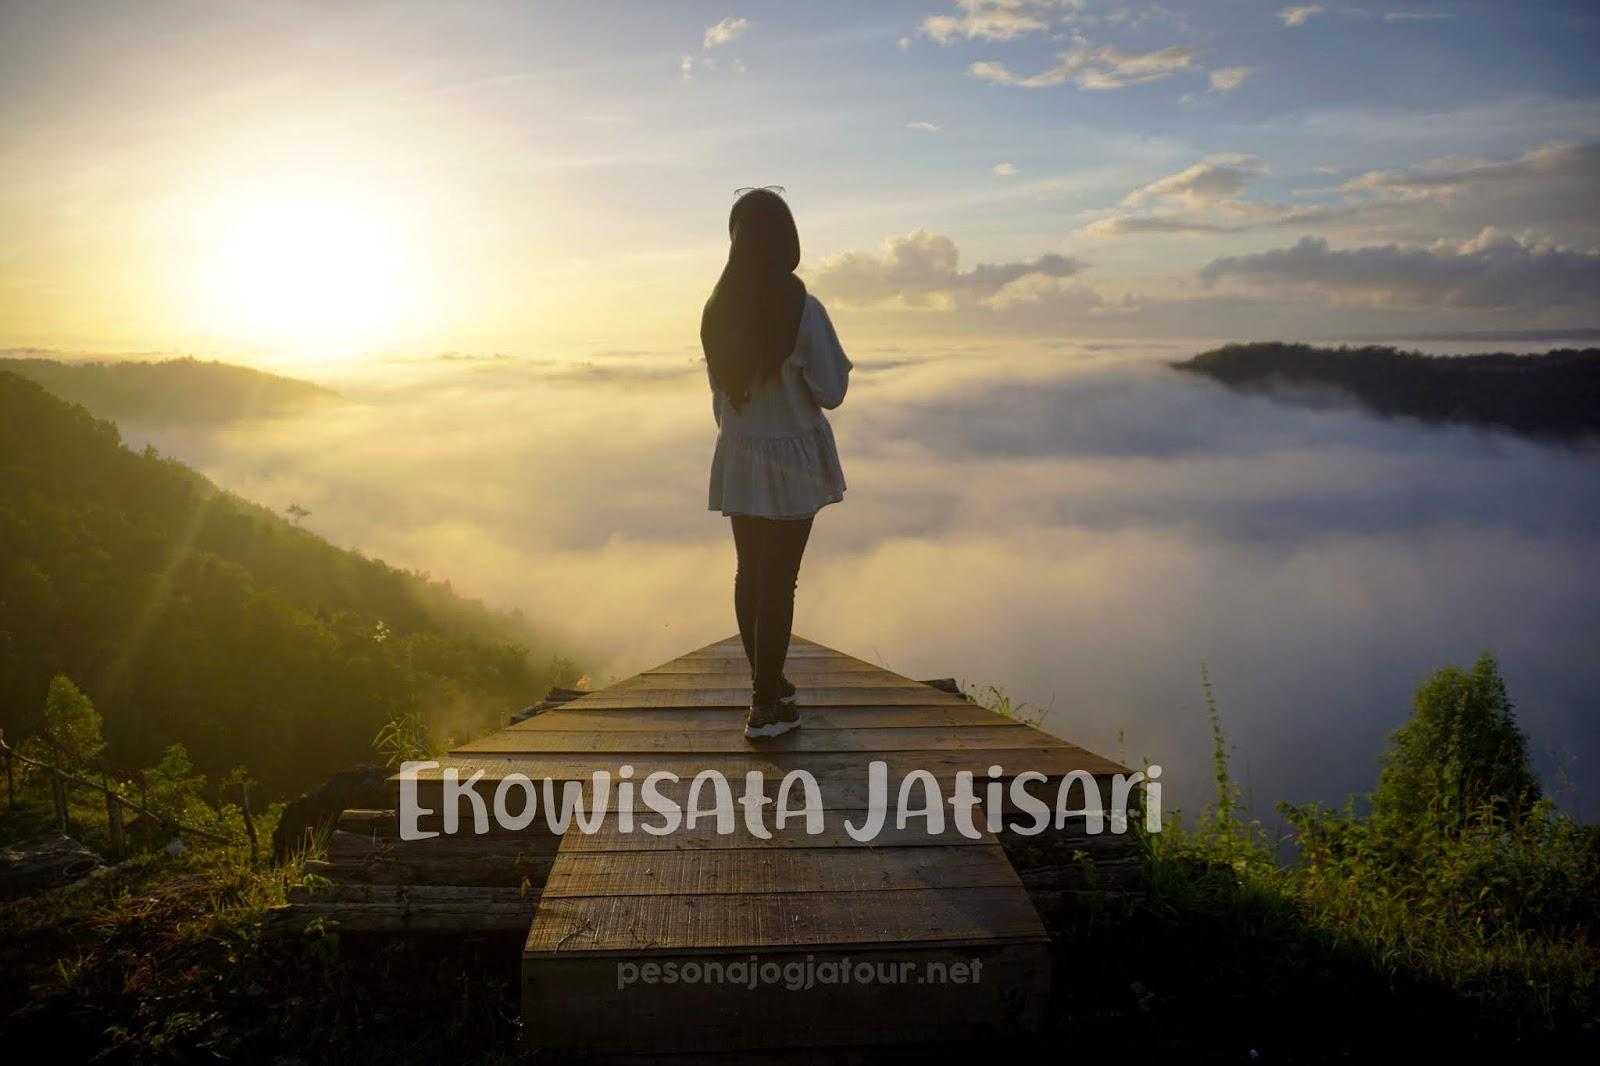 Ekowisata Jatisari Seropan